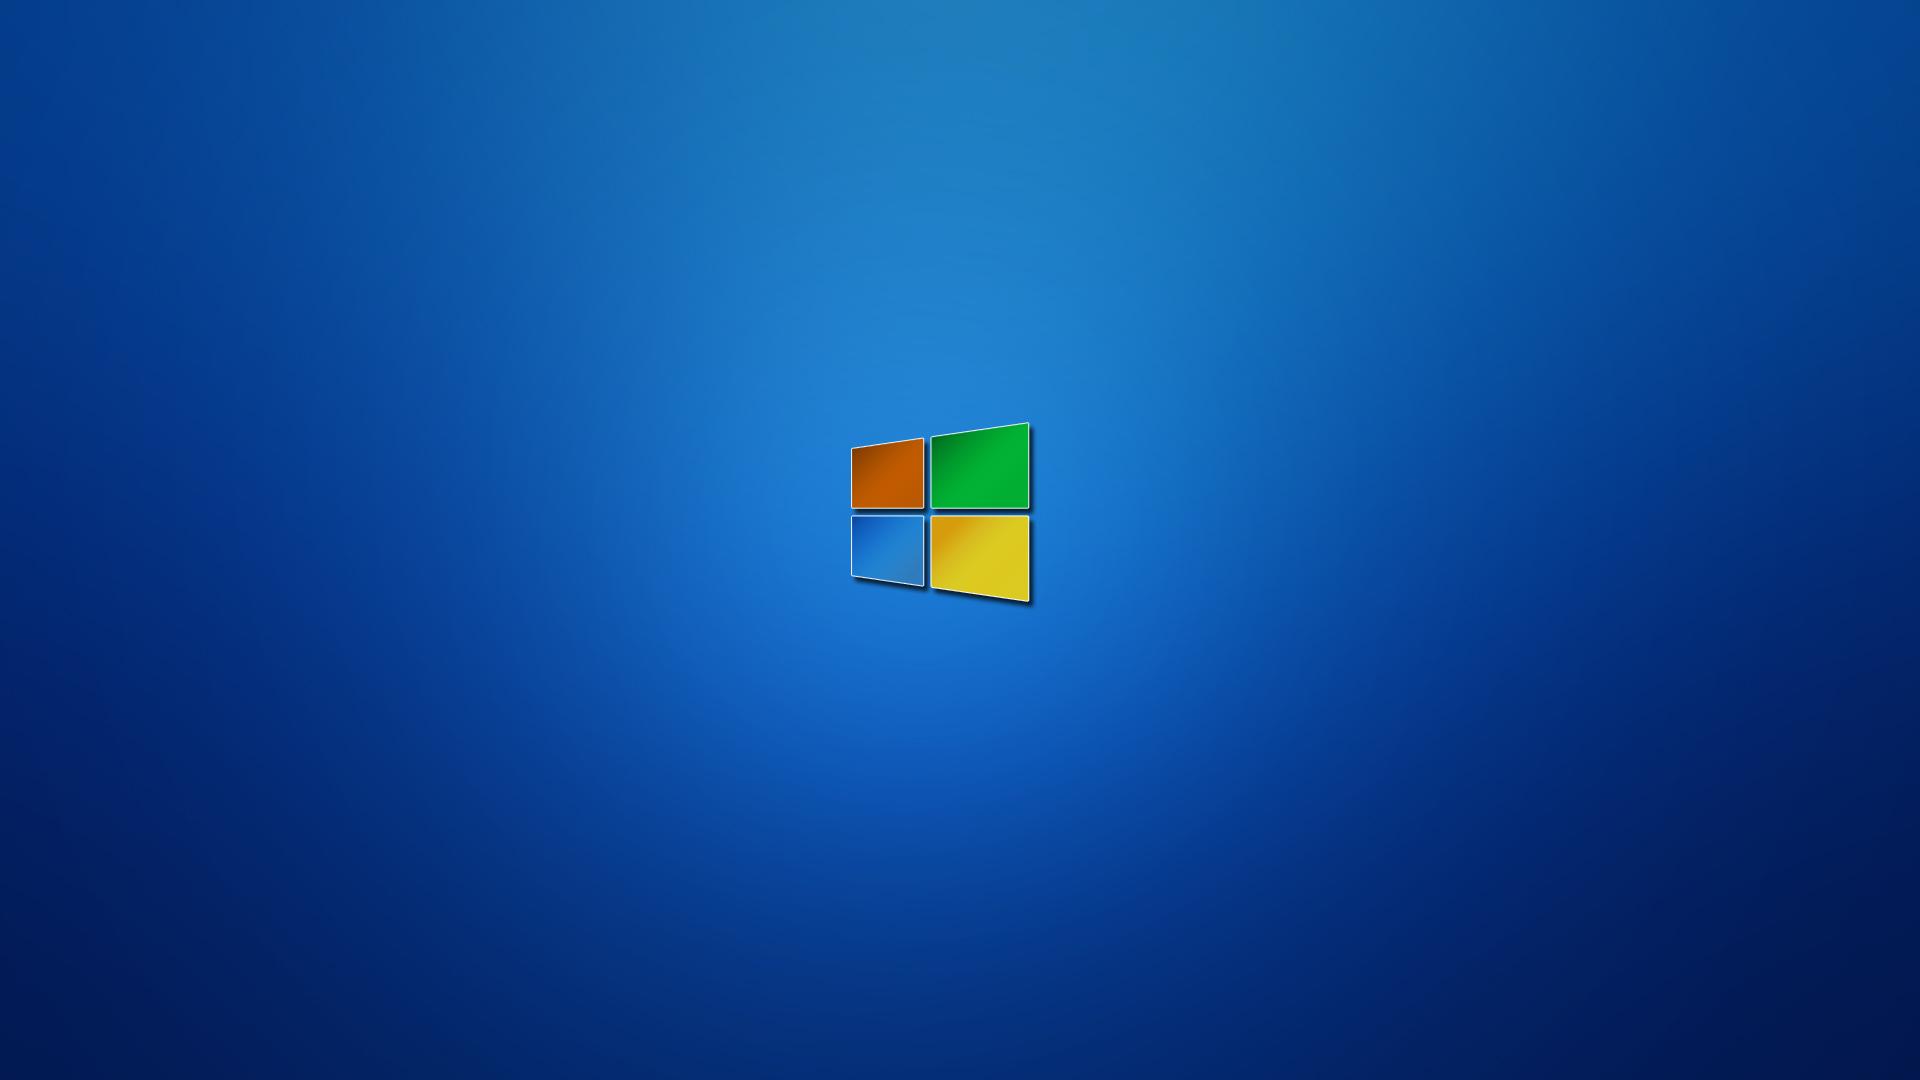 windows 8 metro wallpaper logo by reymondpscene on